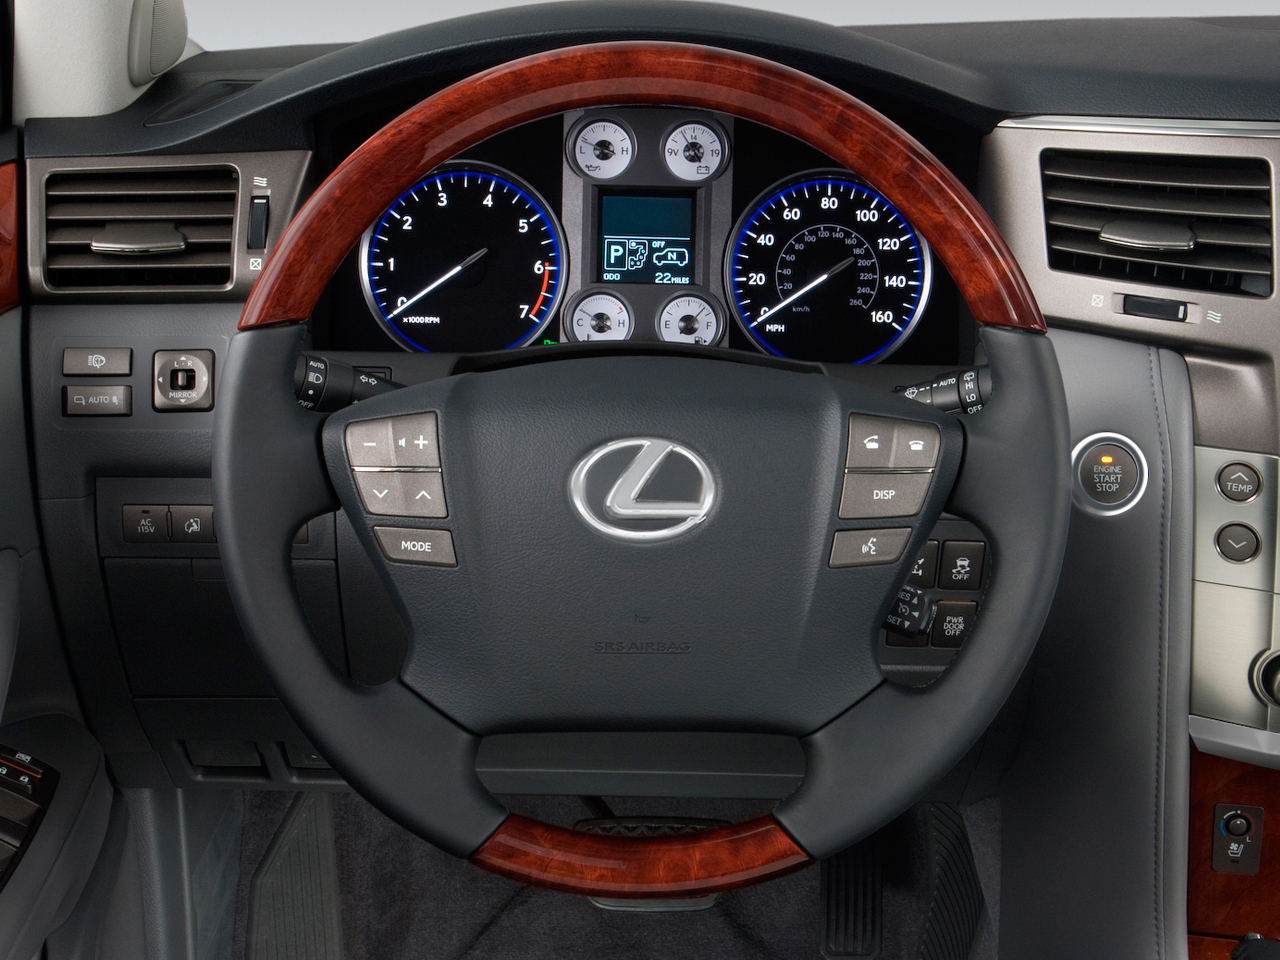 https://st.automobilemag.com/uploads/sites/10/2015/11/2008-lexus-lx-570-sport-utility-suv-steering-wheel.png